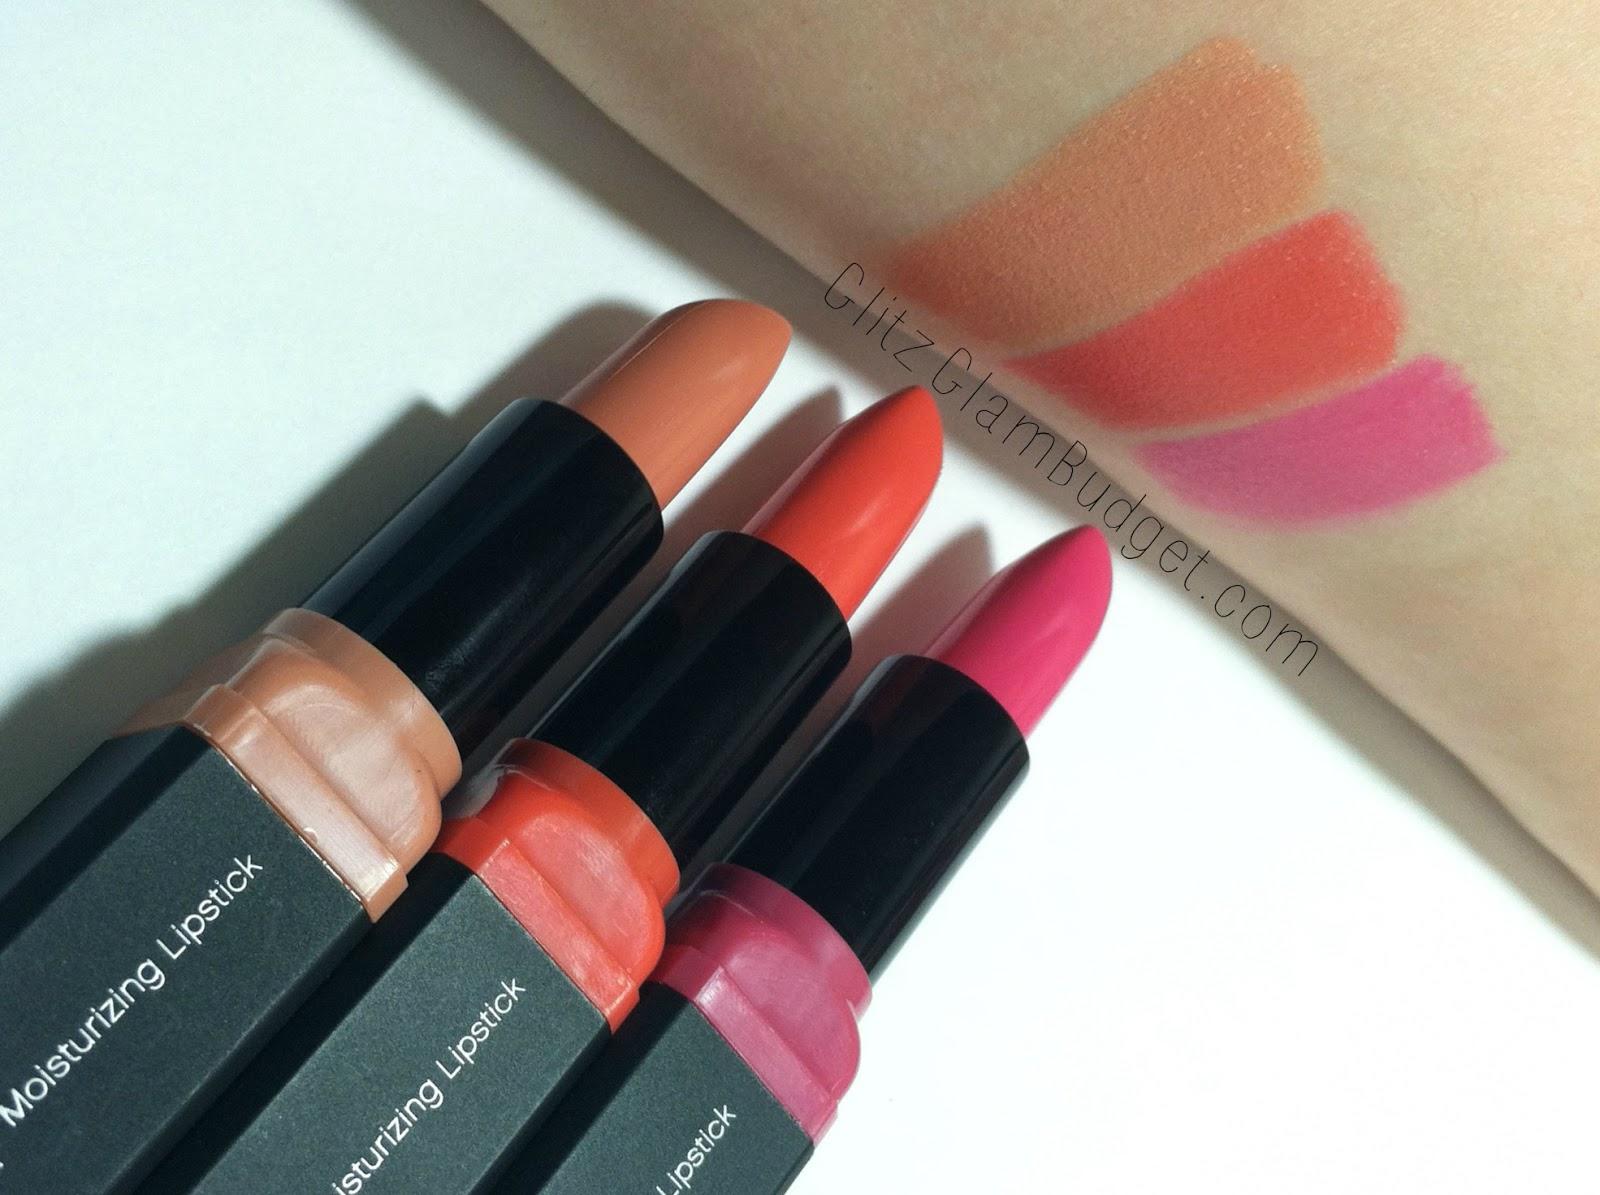 ELF Cosmetics Studio Moisturizing Lipsticks